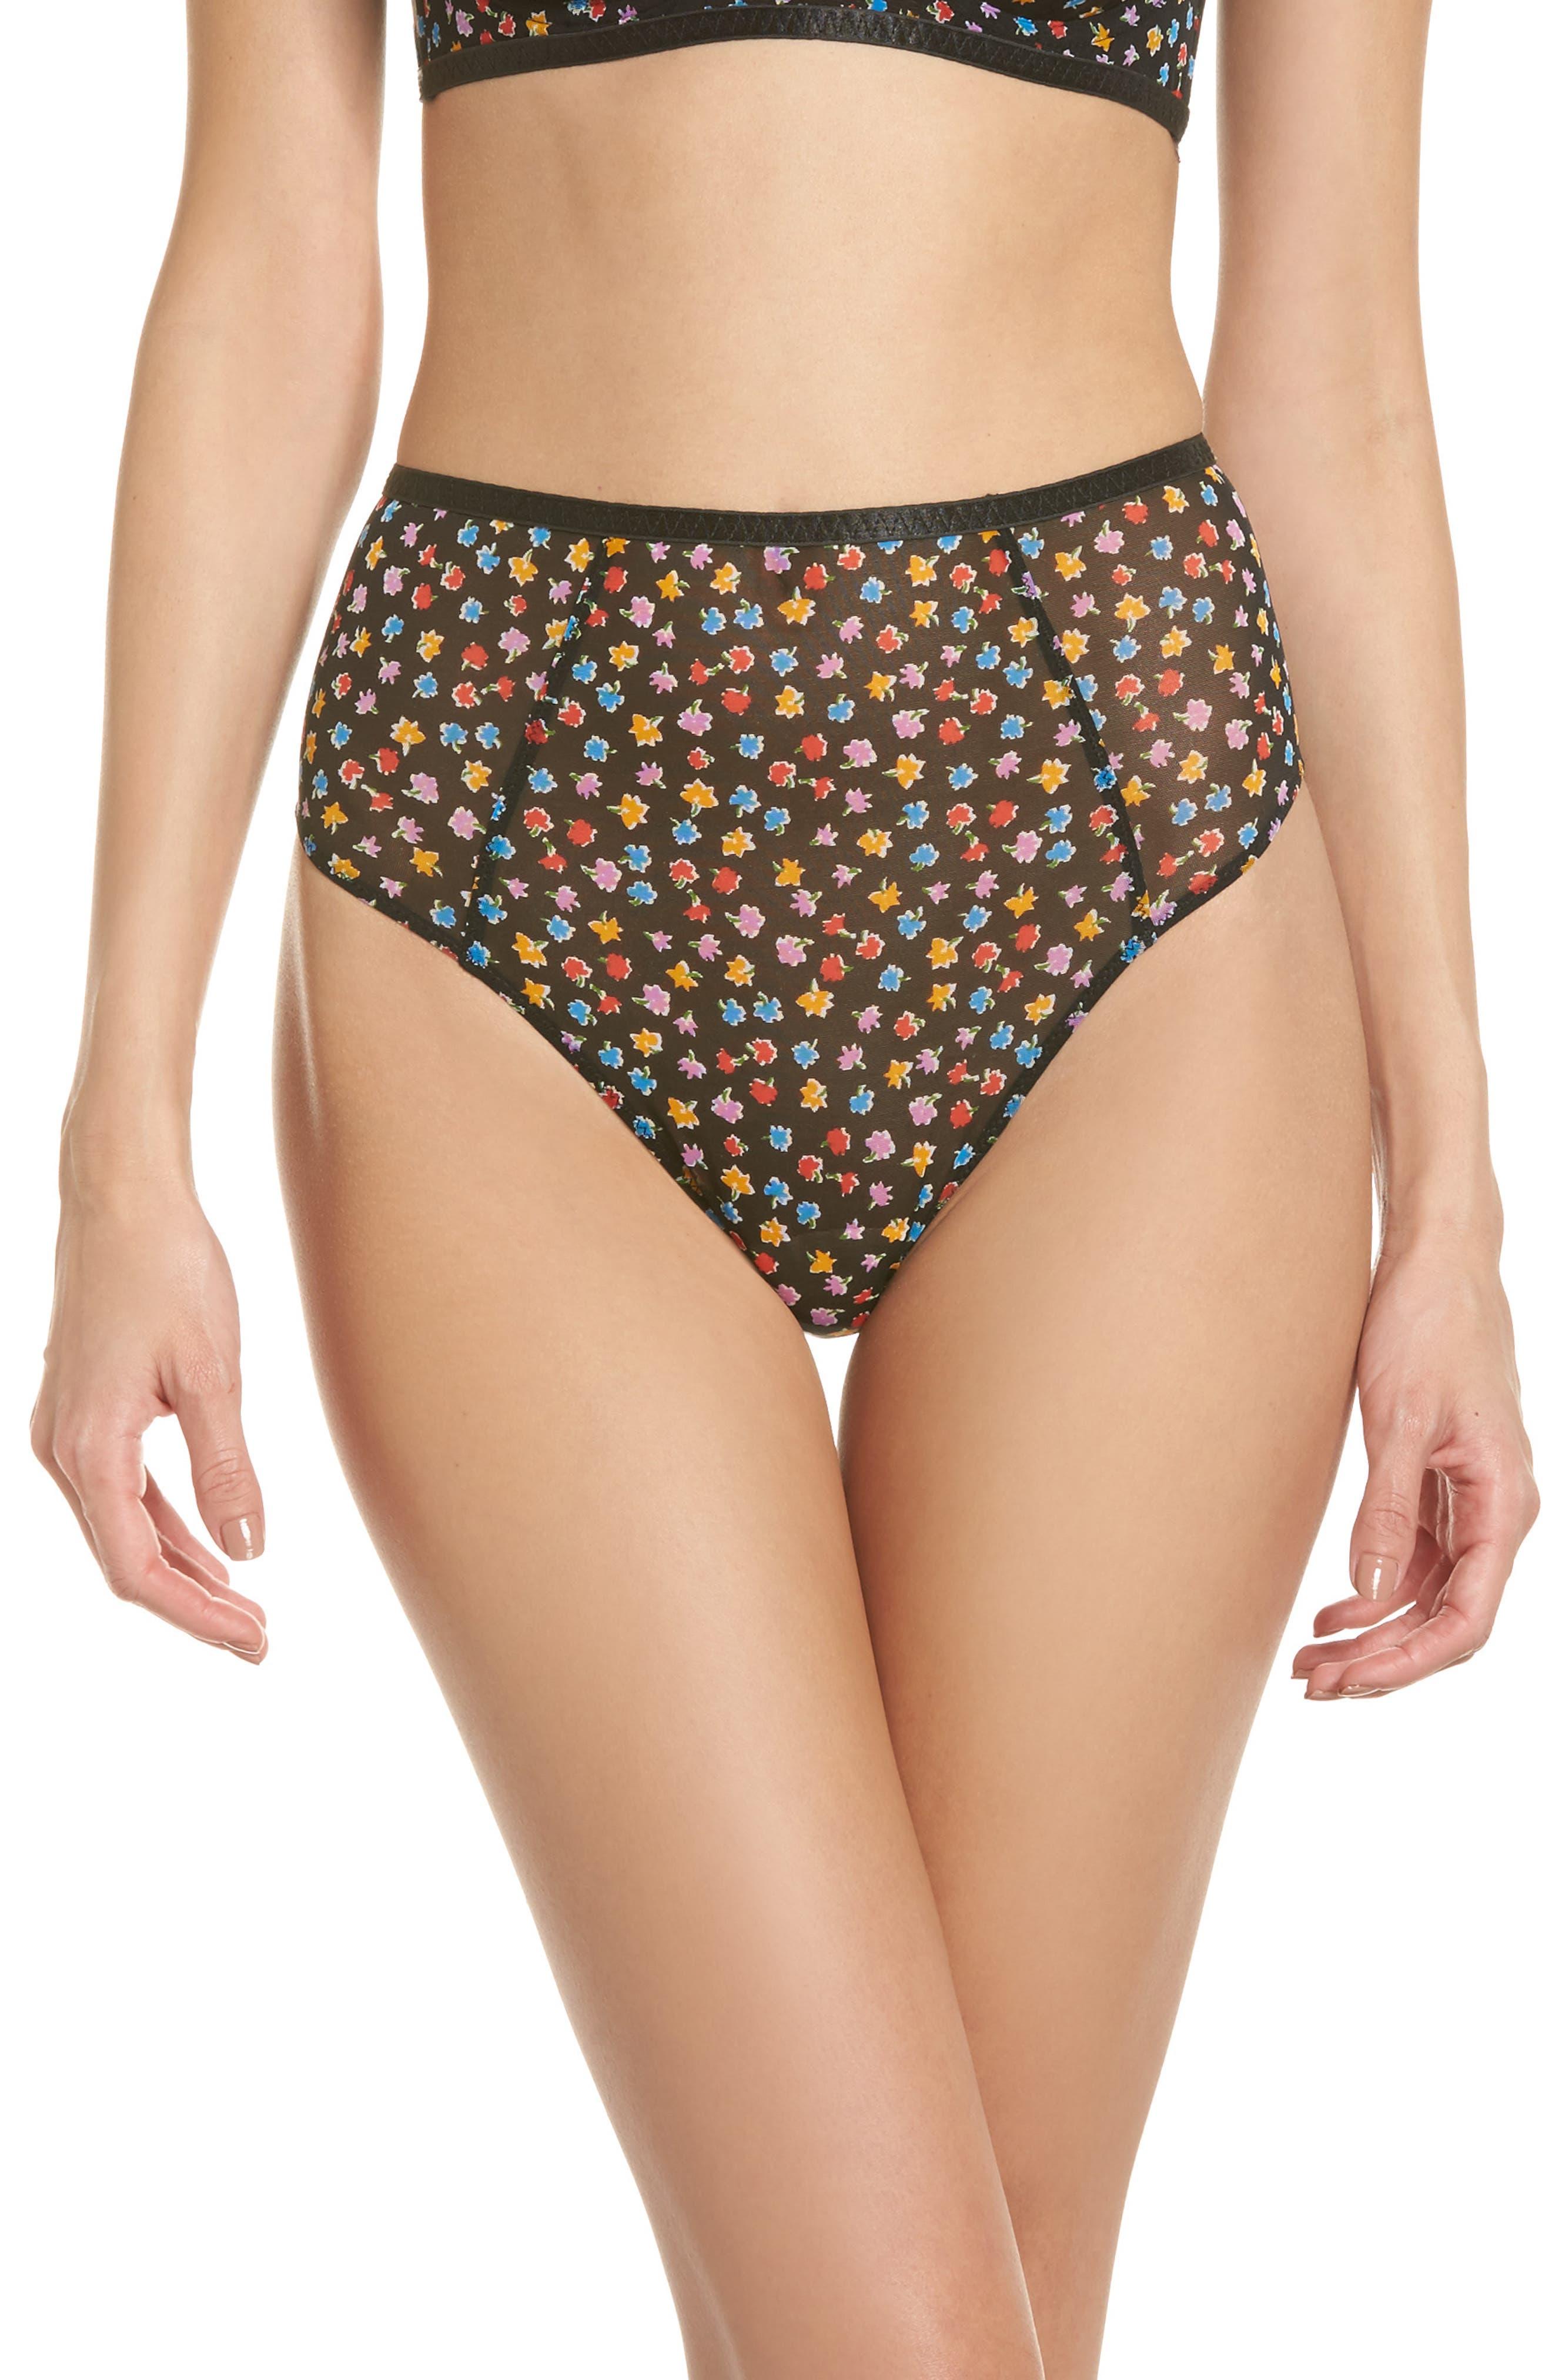 Intimately FP Capri High Waist Panties,                             Main thumbnail 1, color,                             019